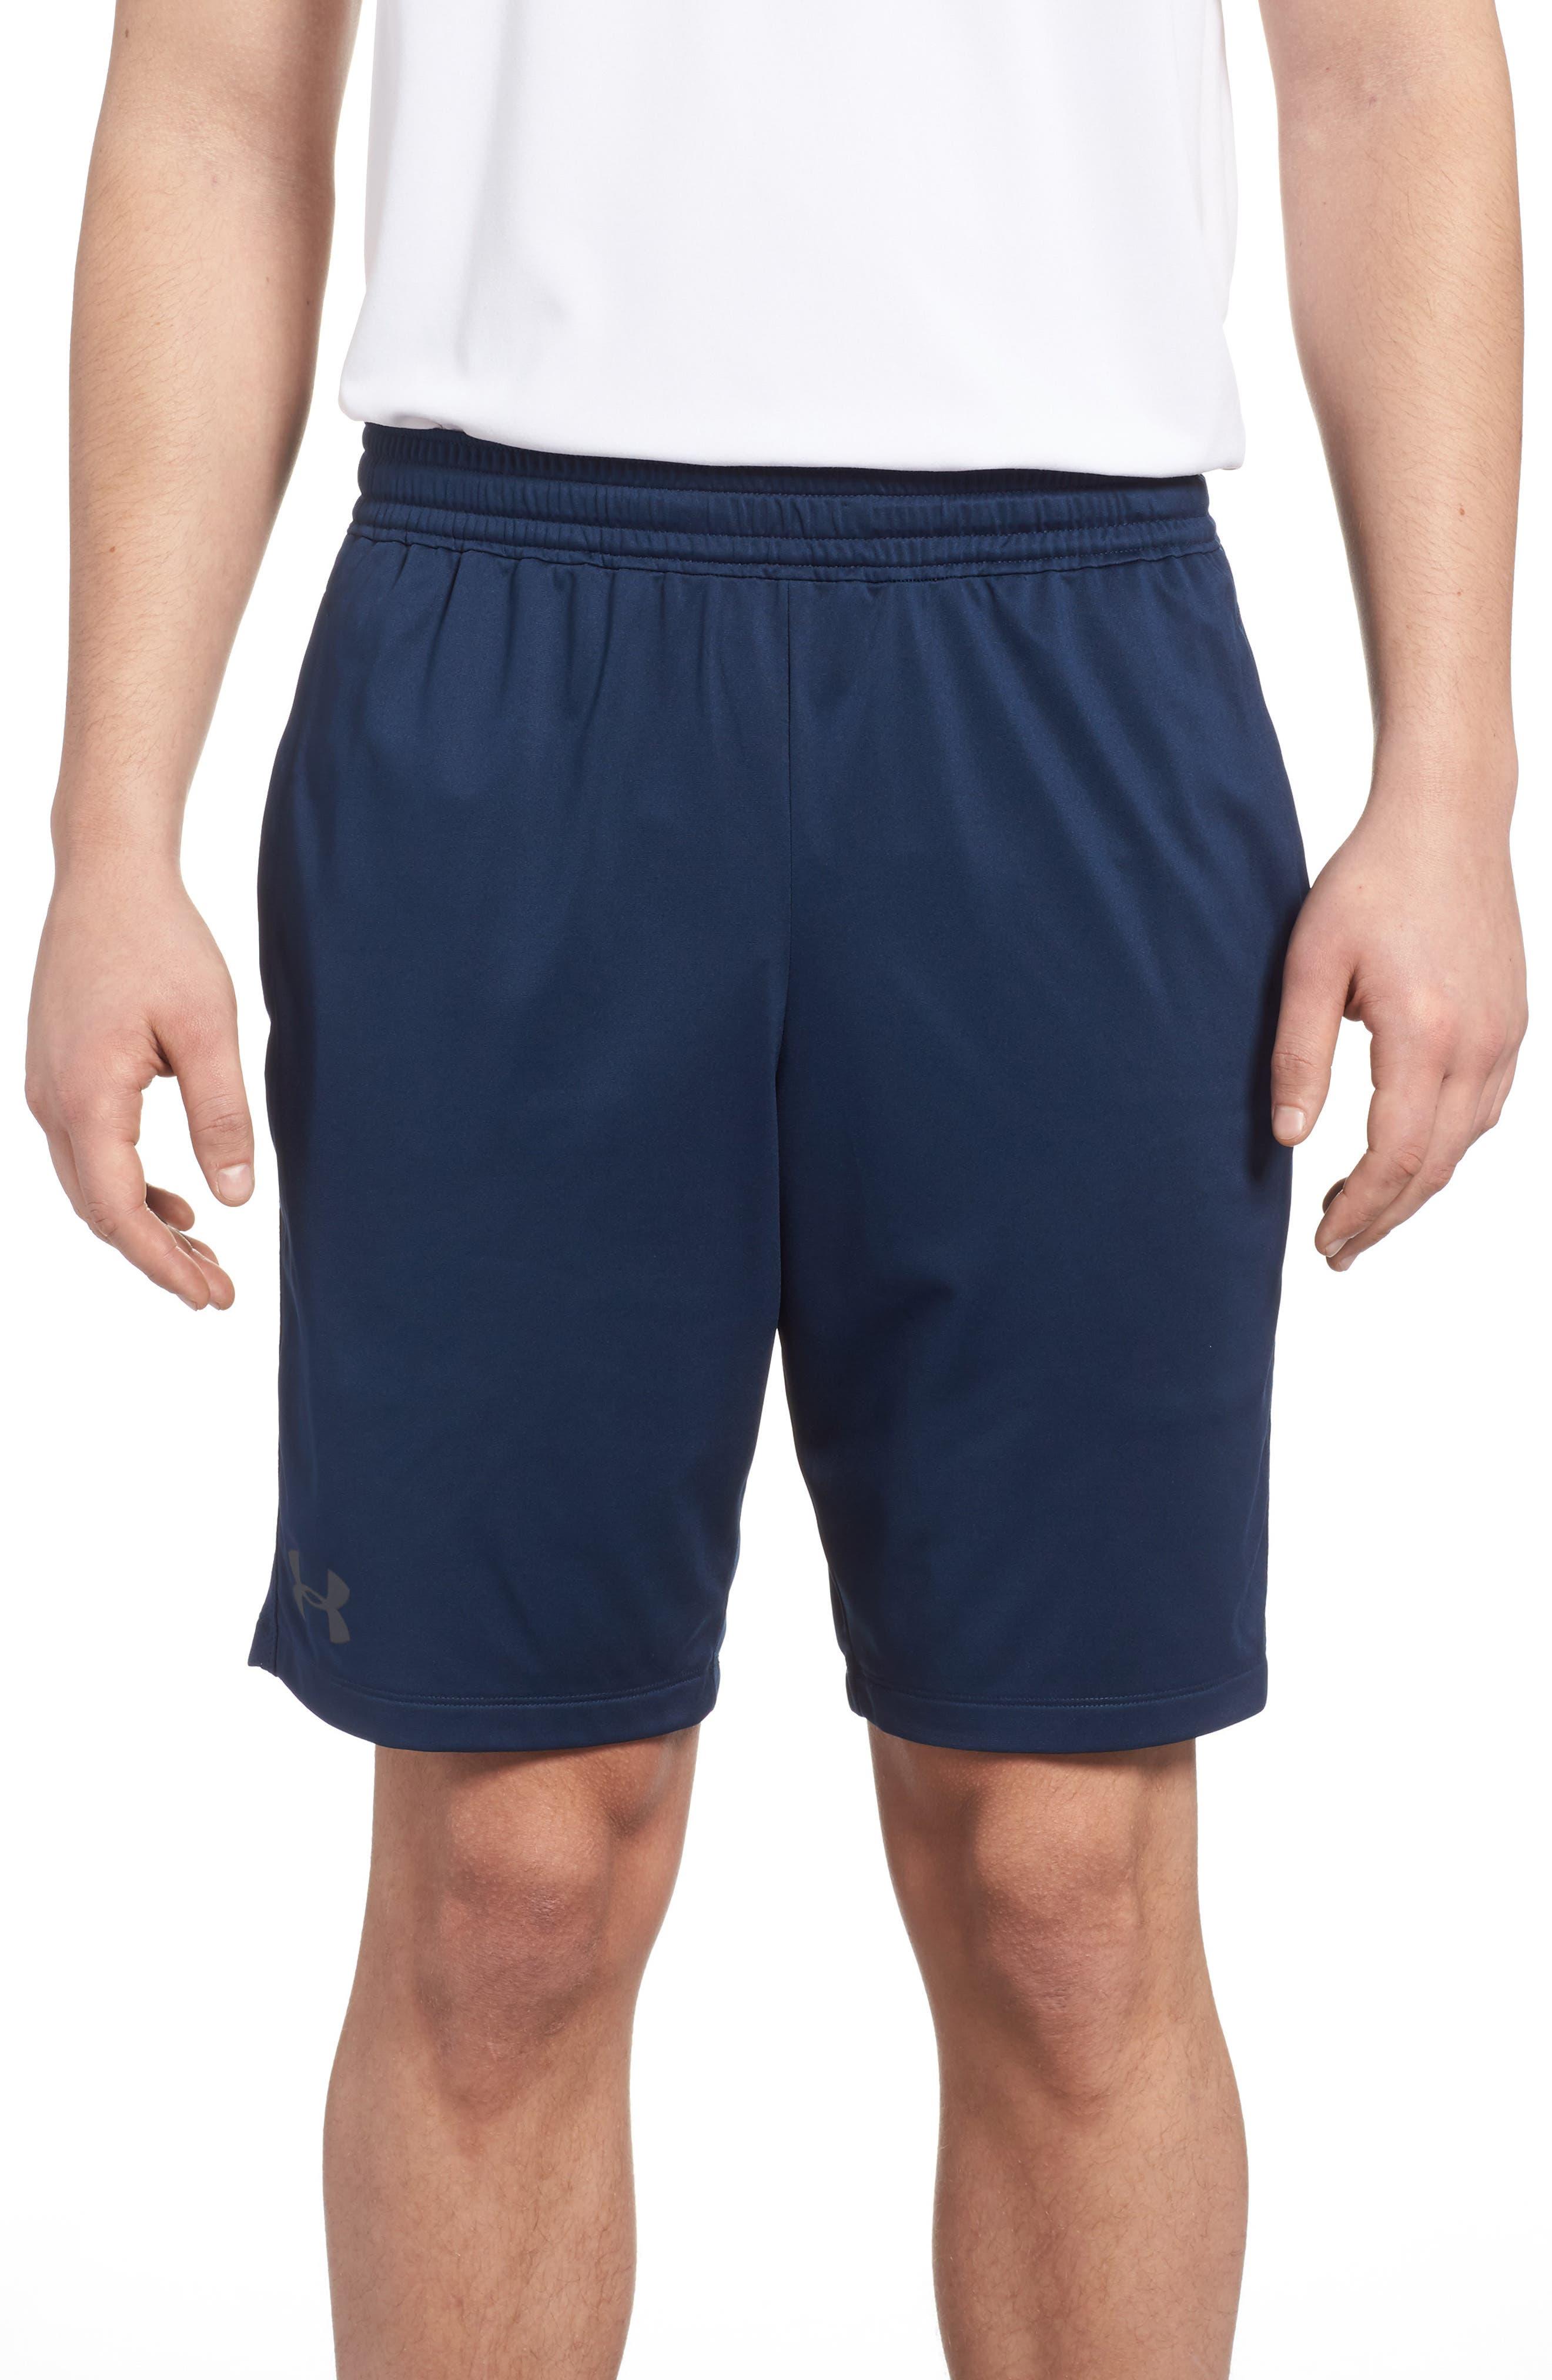 Under Armour Raid 2.0 Classic Fit Shorts